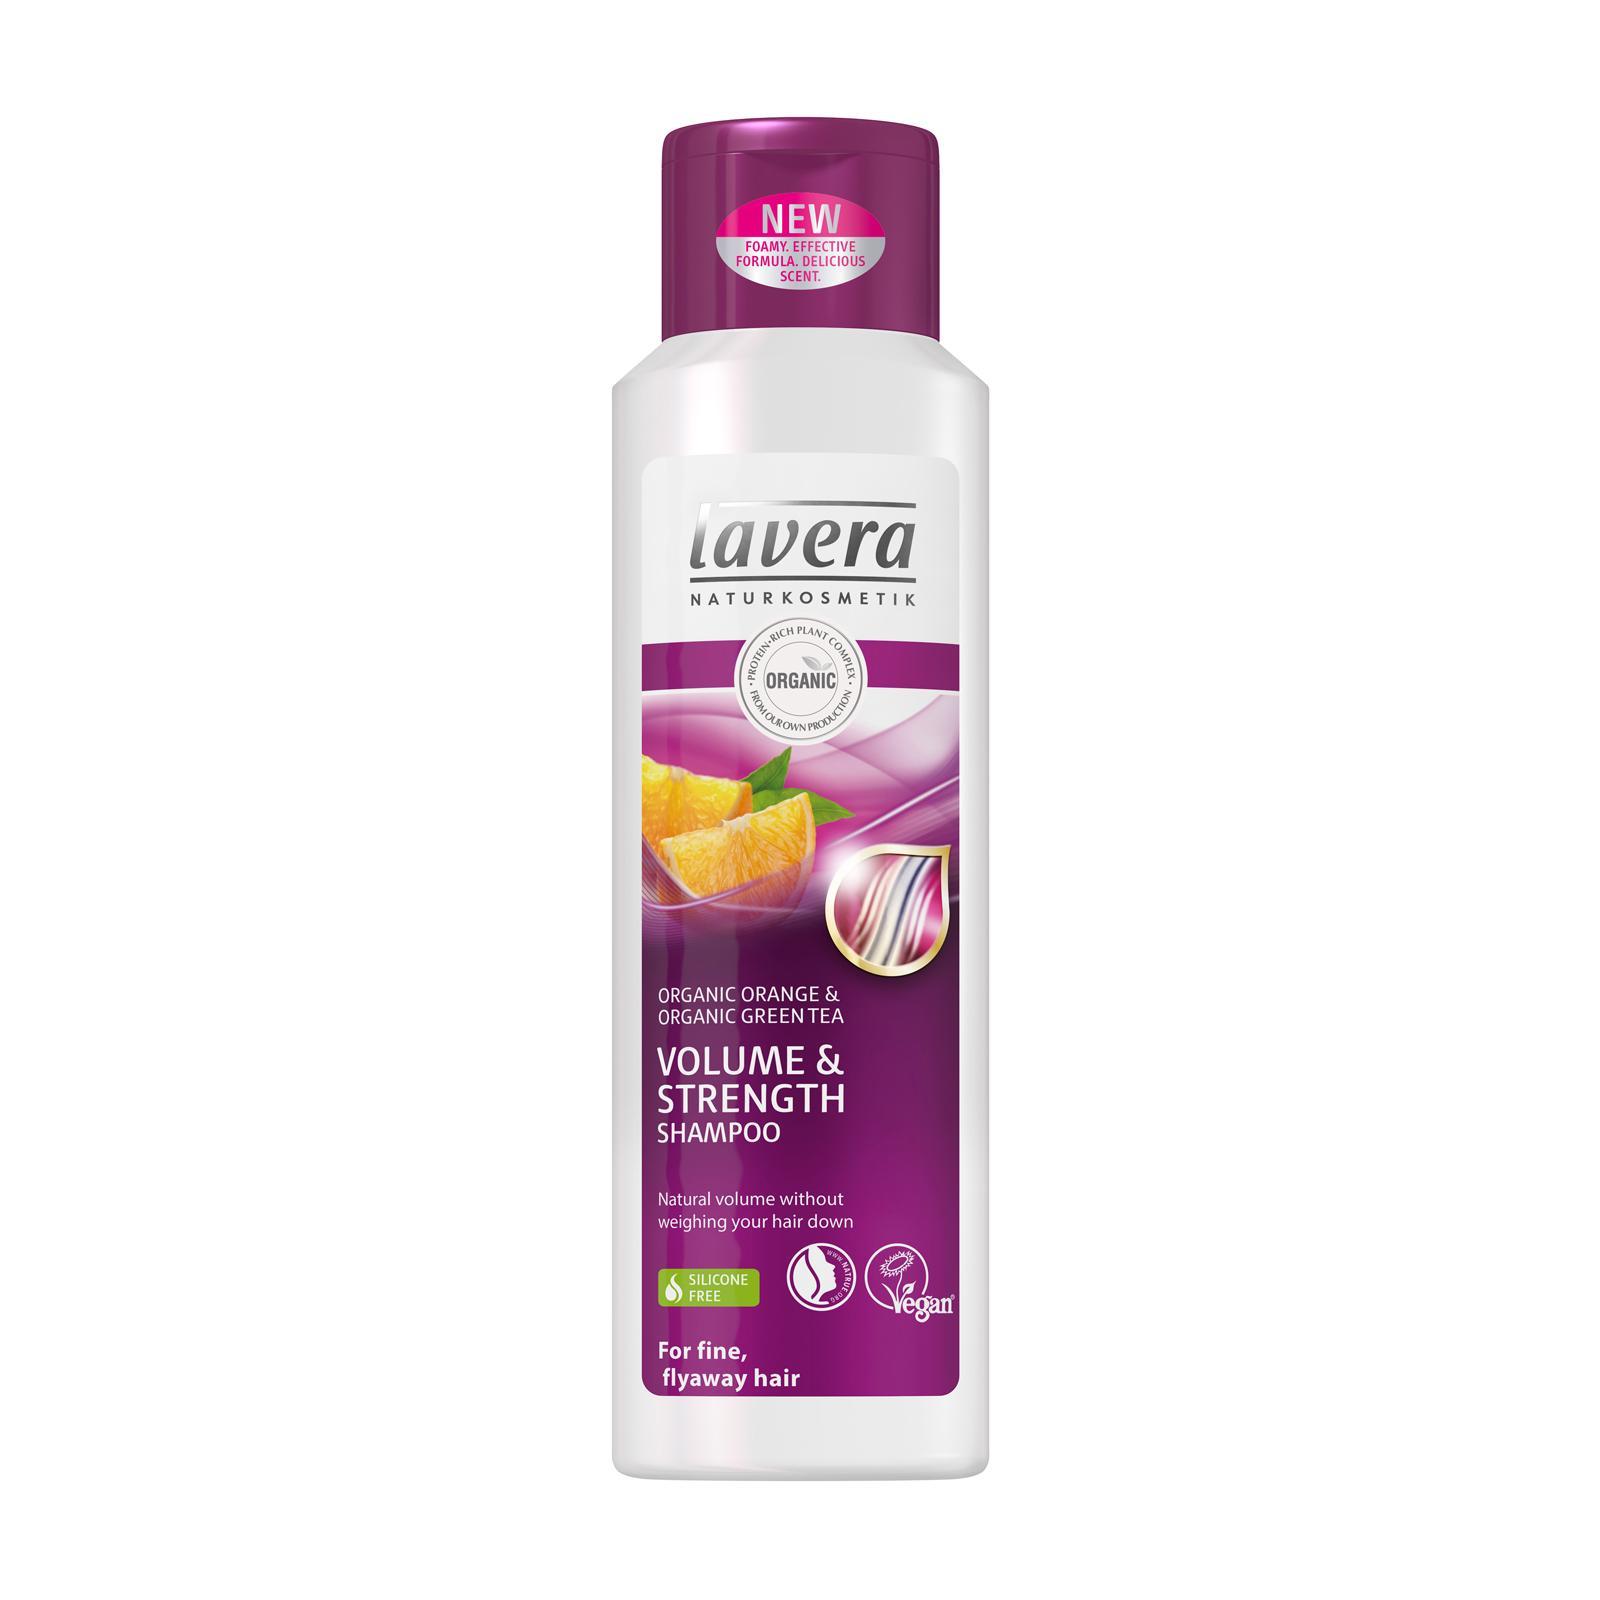 Lavera Šampon Volume, Hair Pro 200 ml